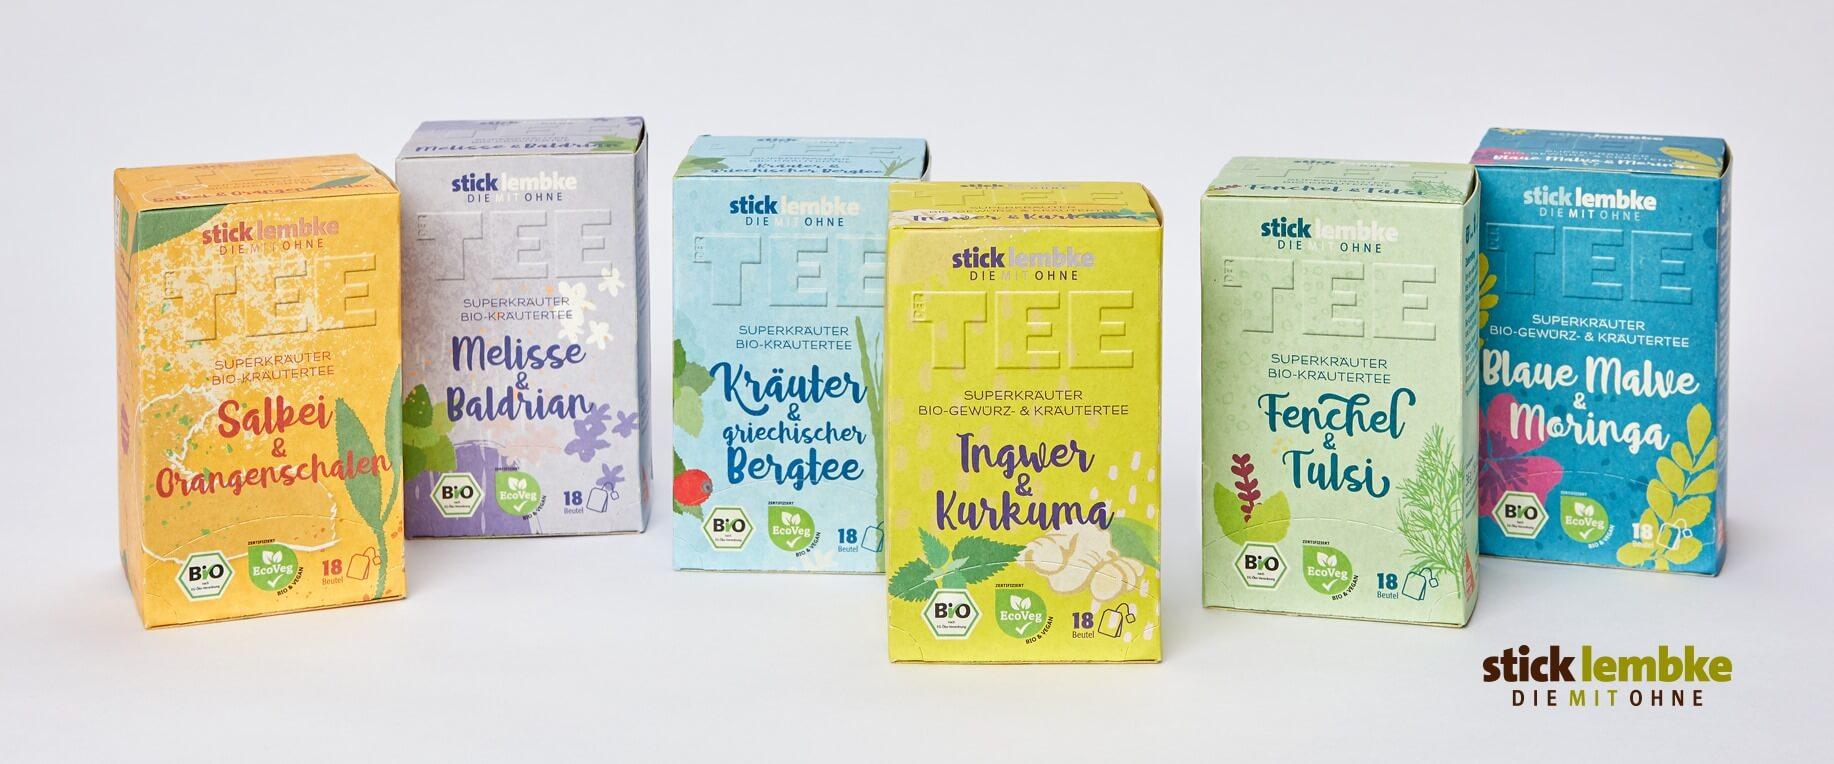 Alle Superkräuter des Hamburger Tee-Unternehmens stick&lembke